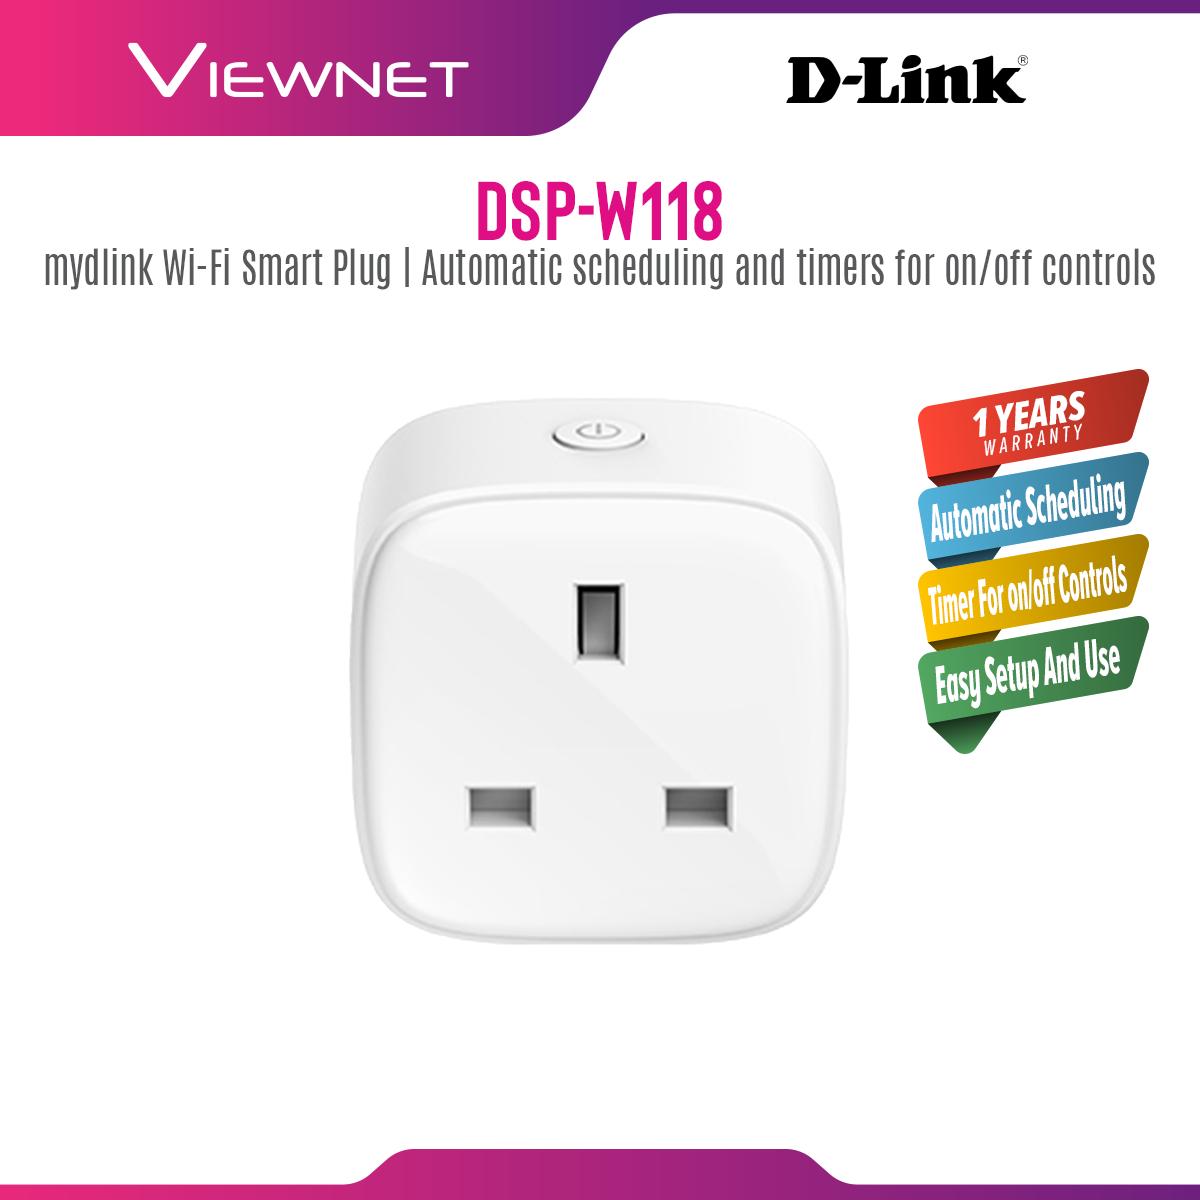 D-Link DSP-W118 mydlink Mini Wi-Fi Smart Plug DSP W118